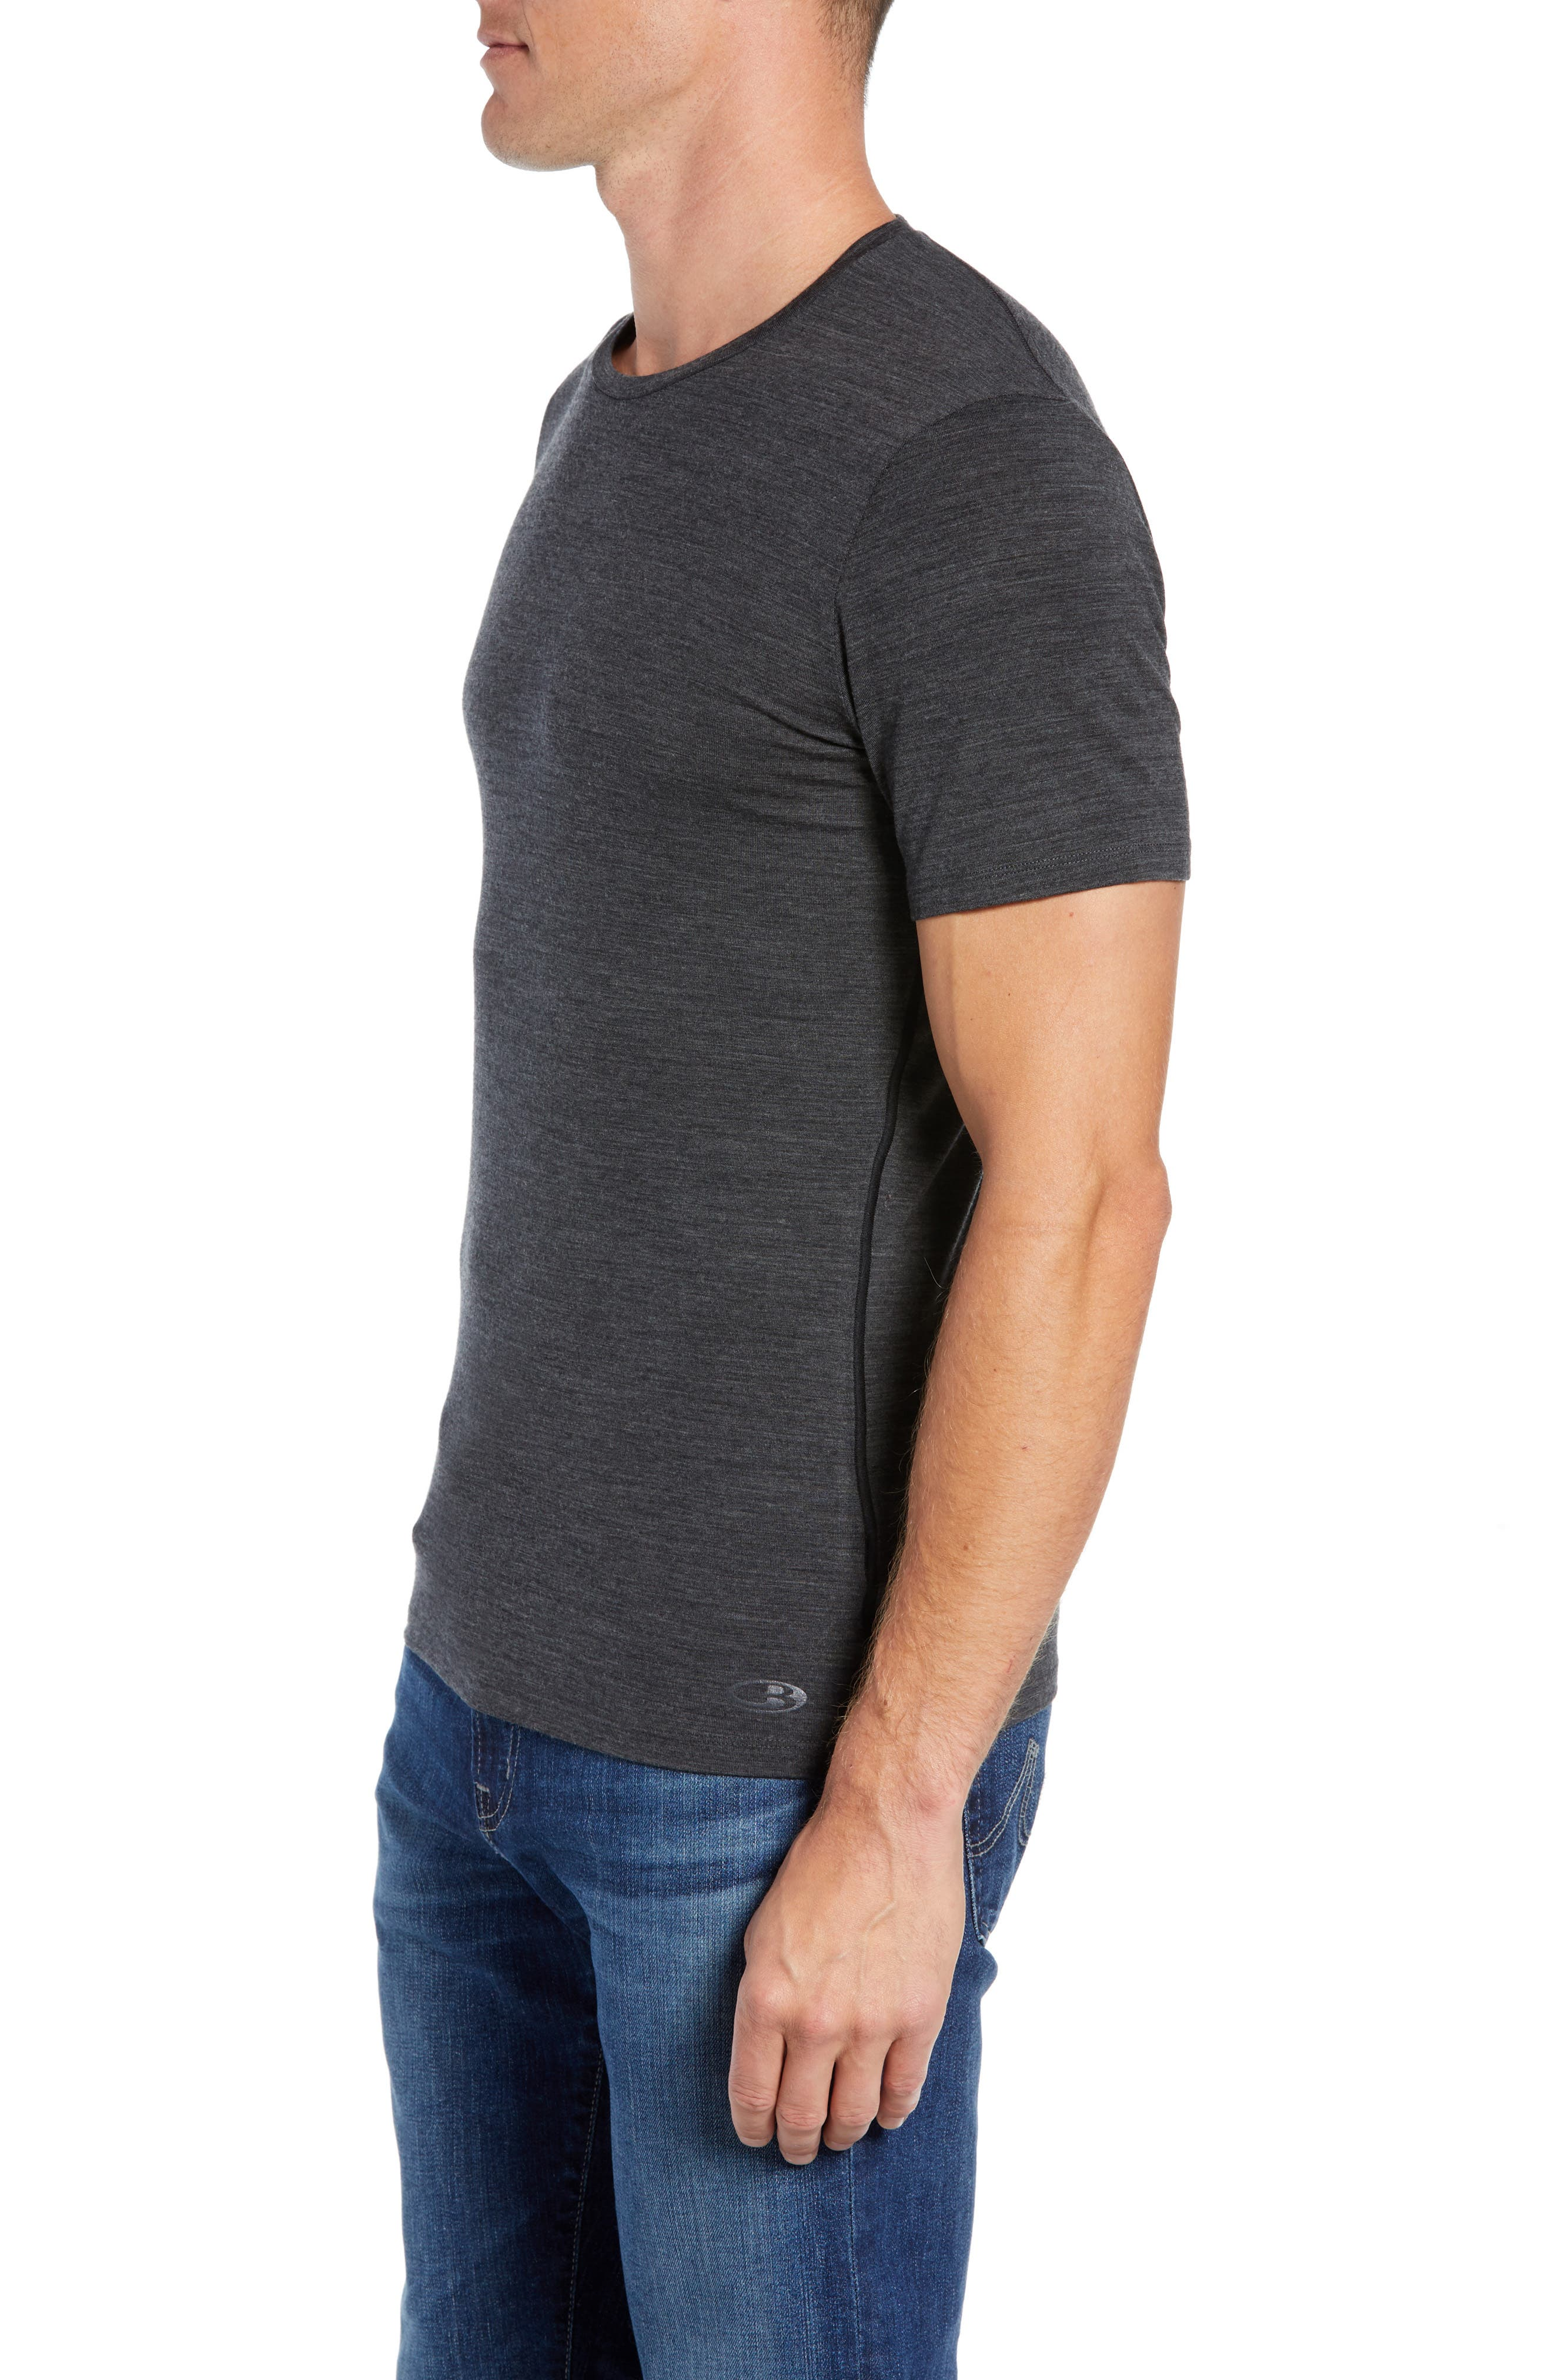 Anatomica Short Sleeve Crewneck T-Shirt,                             Alternate thumbnail 3, color,                             JET HEATHER/ BLACK